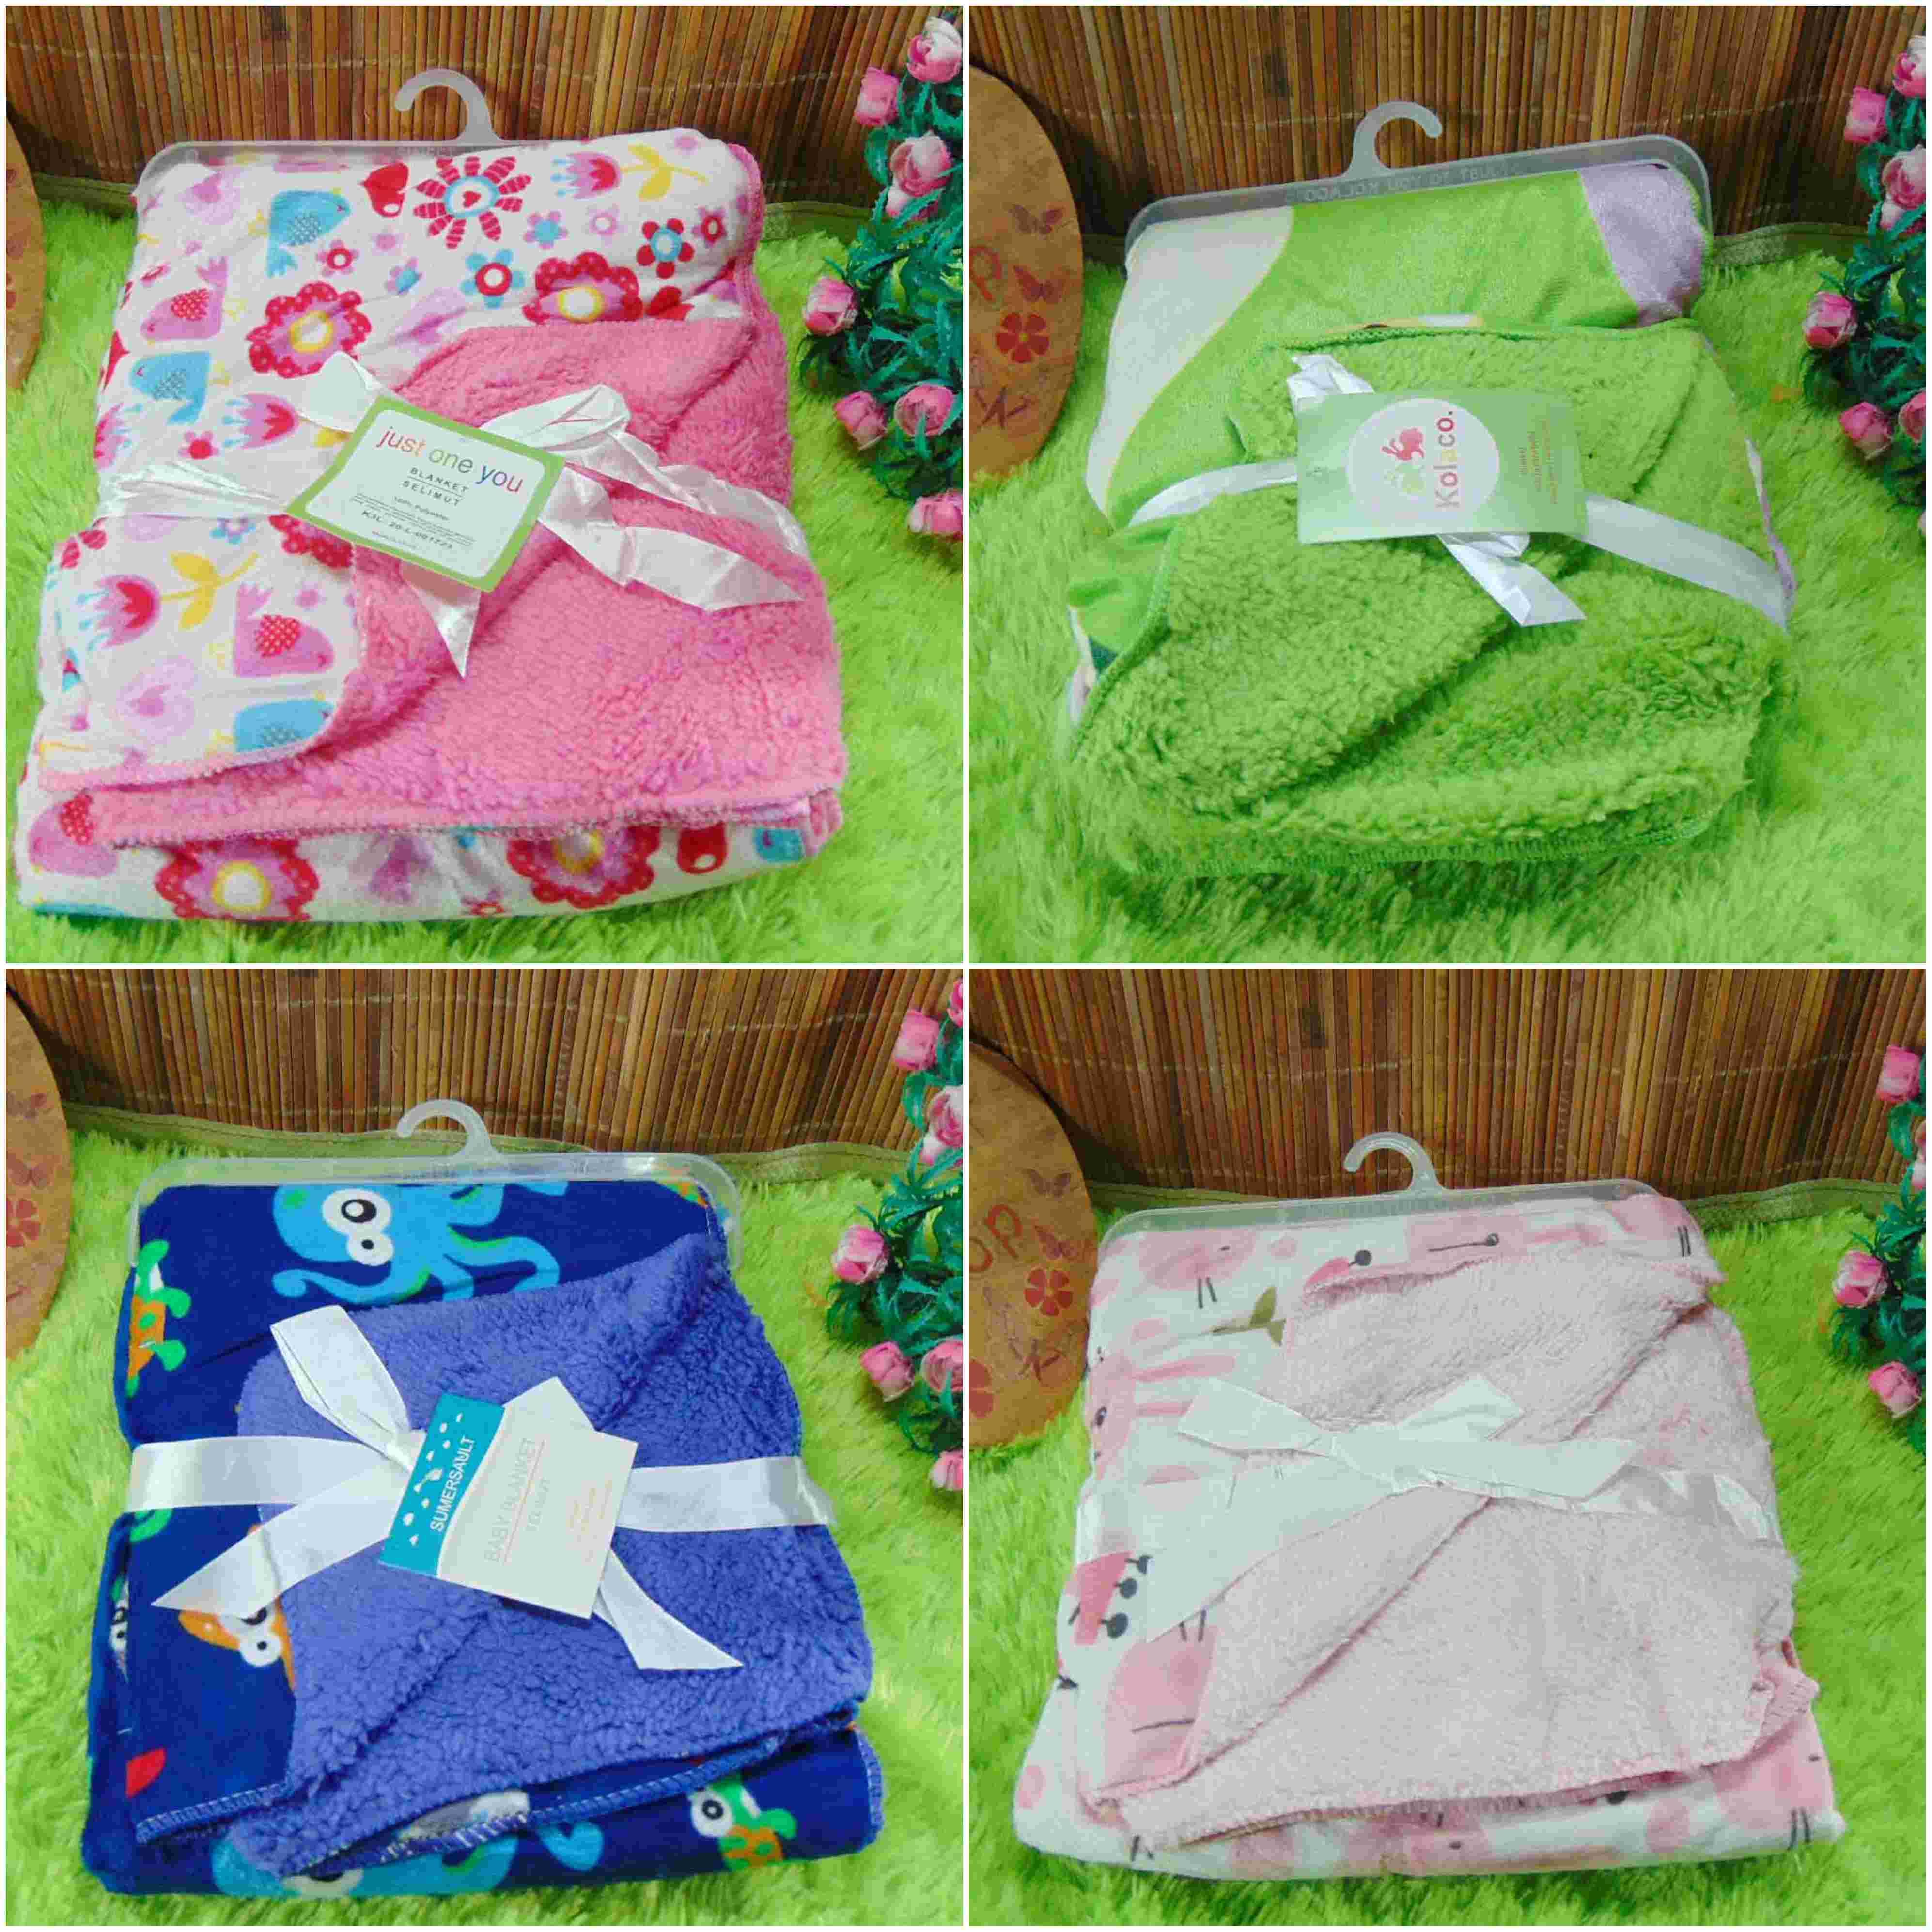 kado bayi baby gift selimut carter double fleece bayi aneka motif (5)